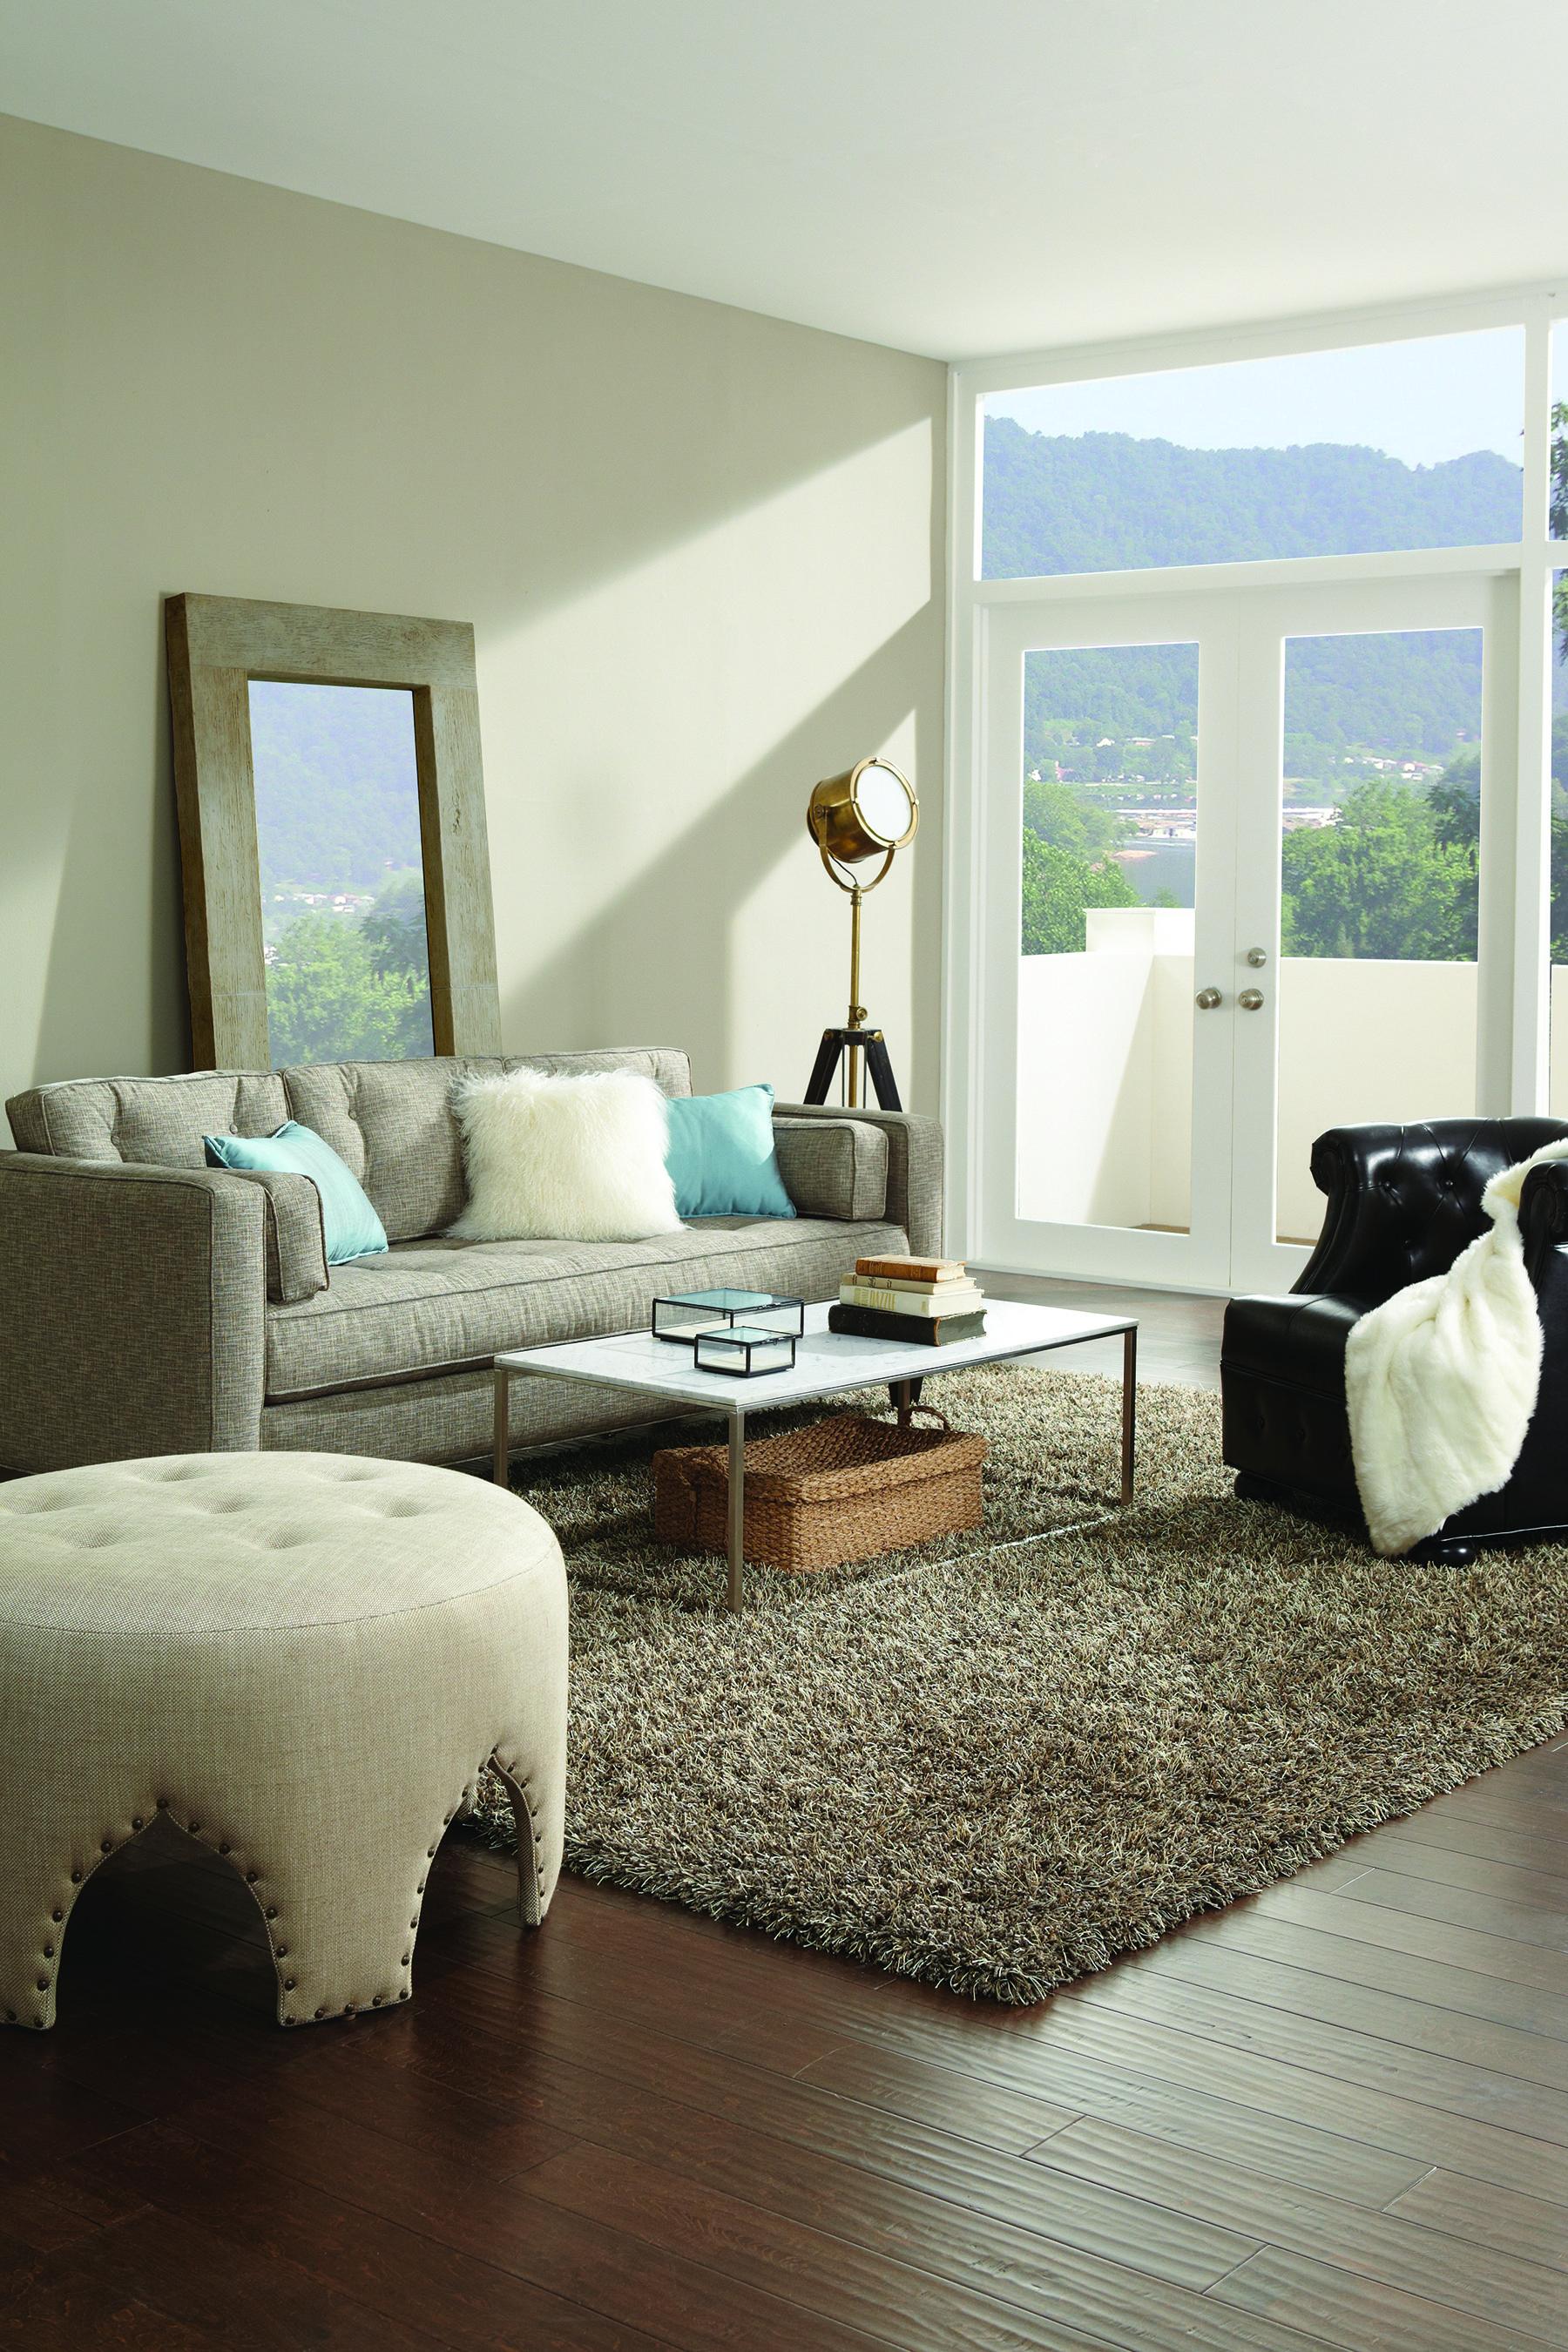 31++ Living room area rugs ideas information